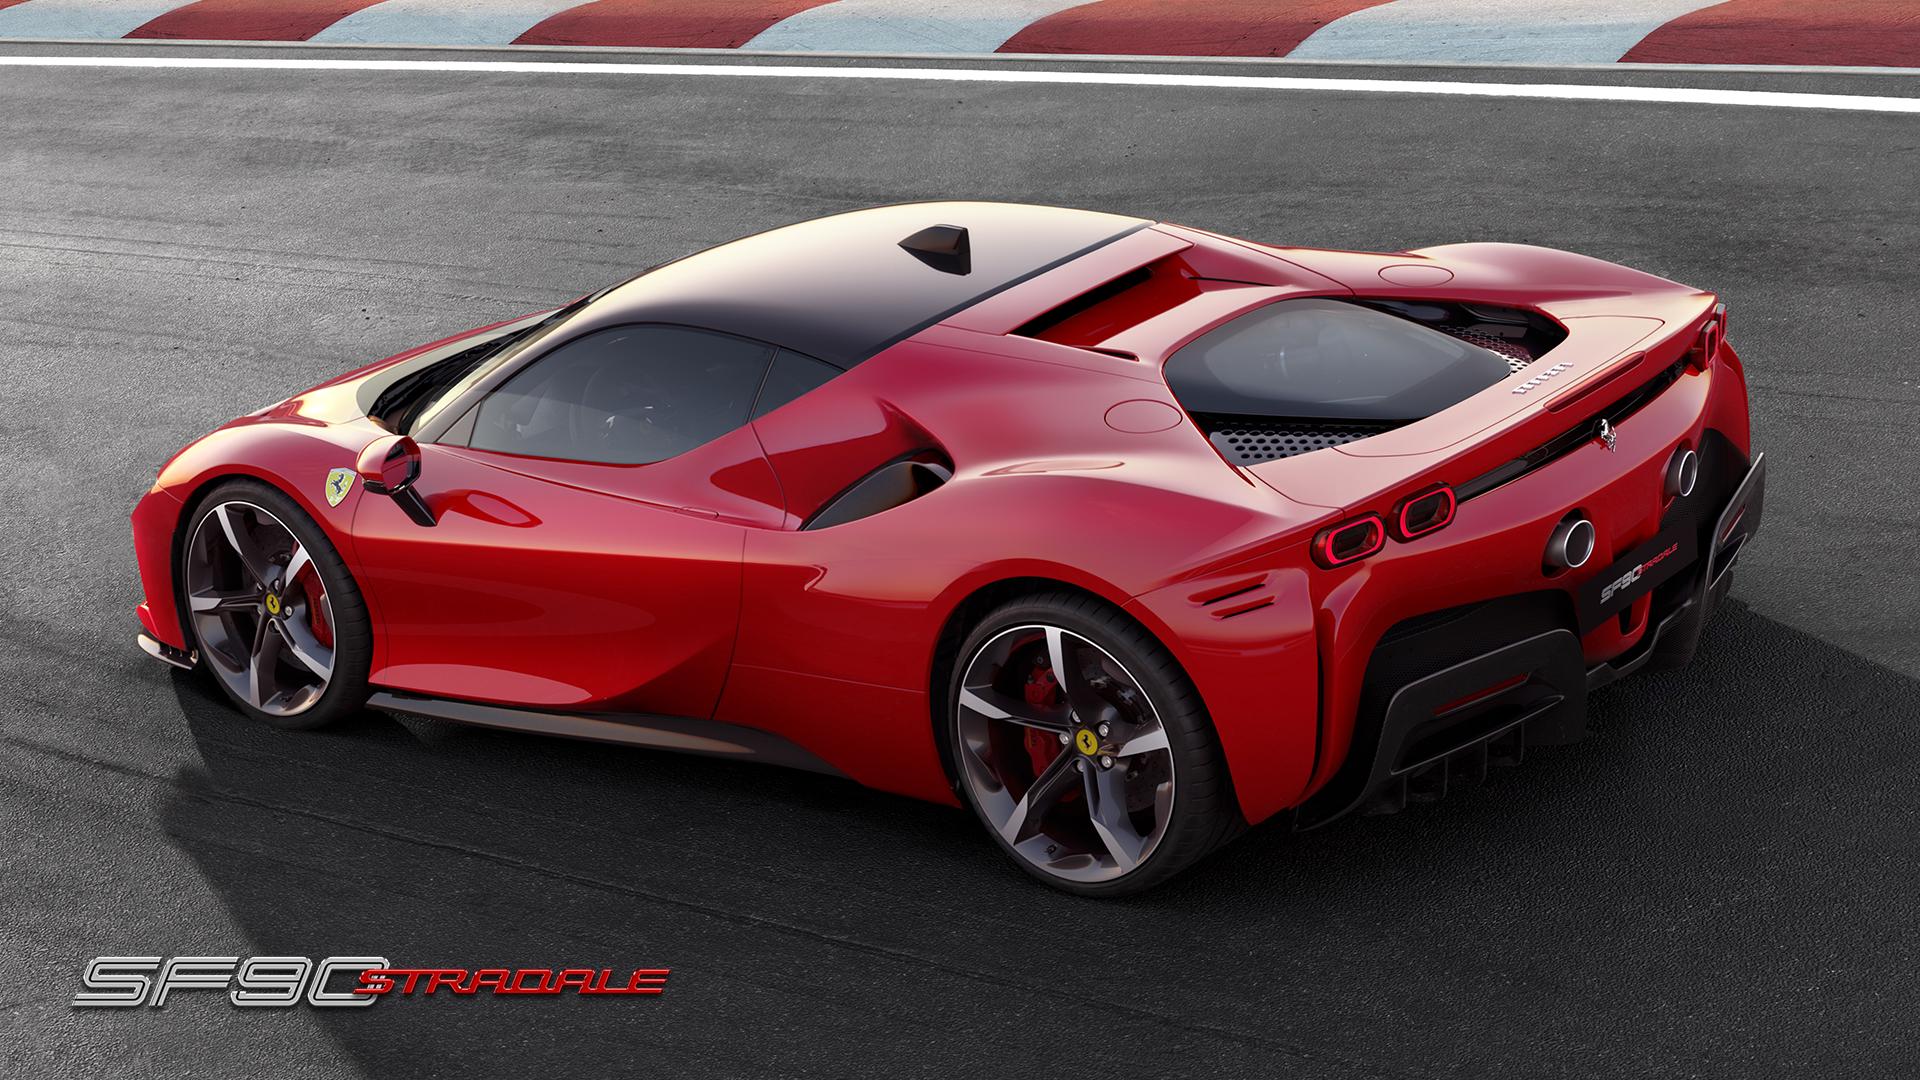 190161-car-Ferrari-SF90-Stradale.jpg